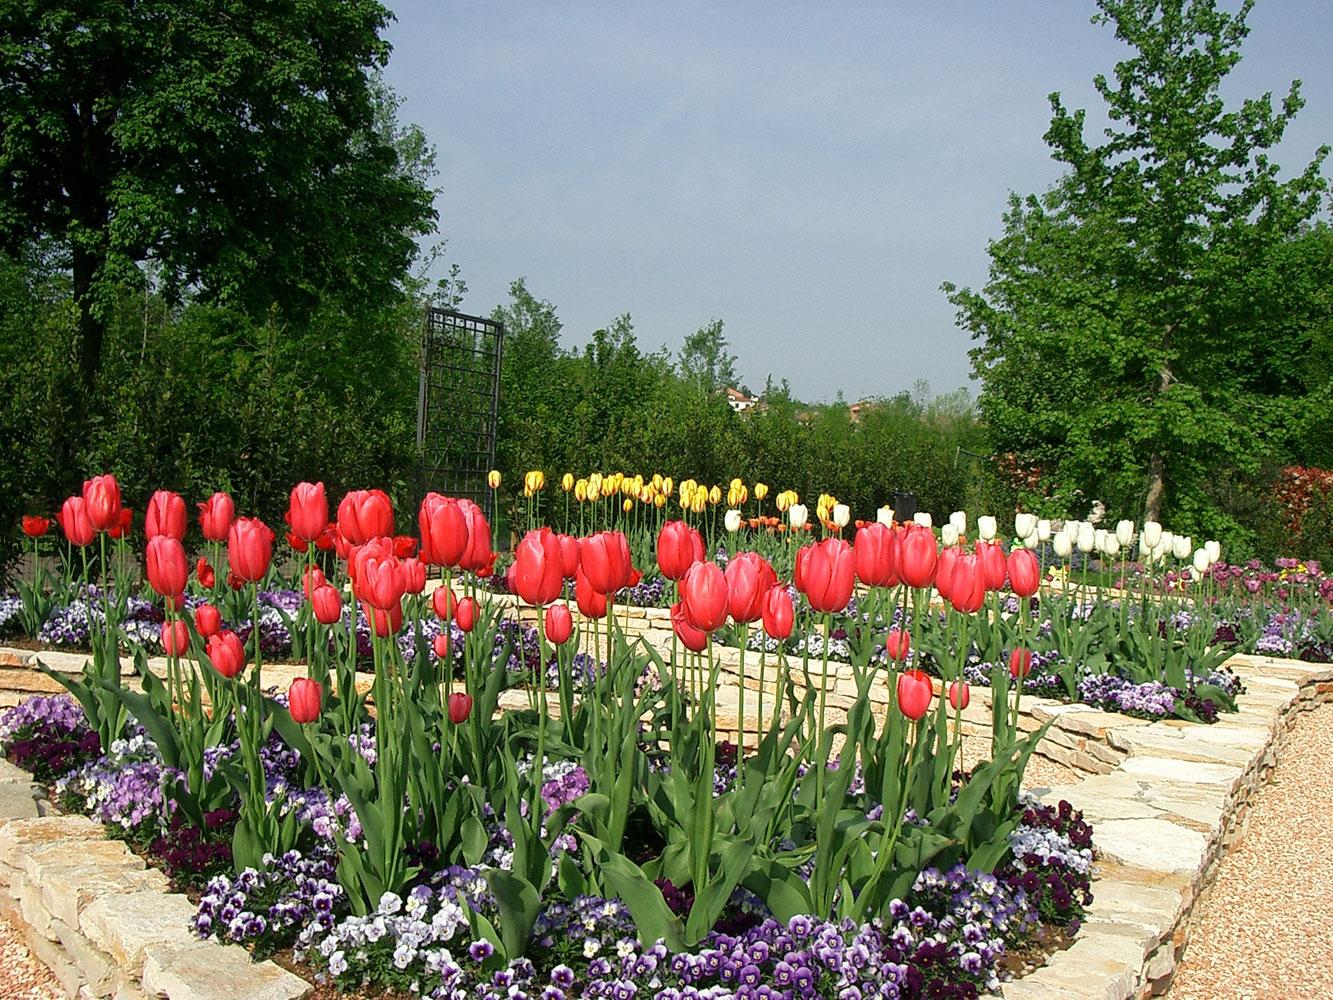 Il giardino segreto il giardino degli angeli